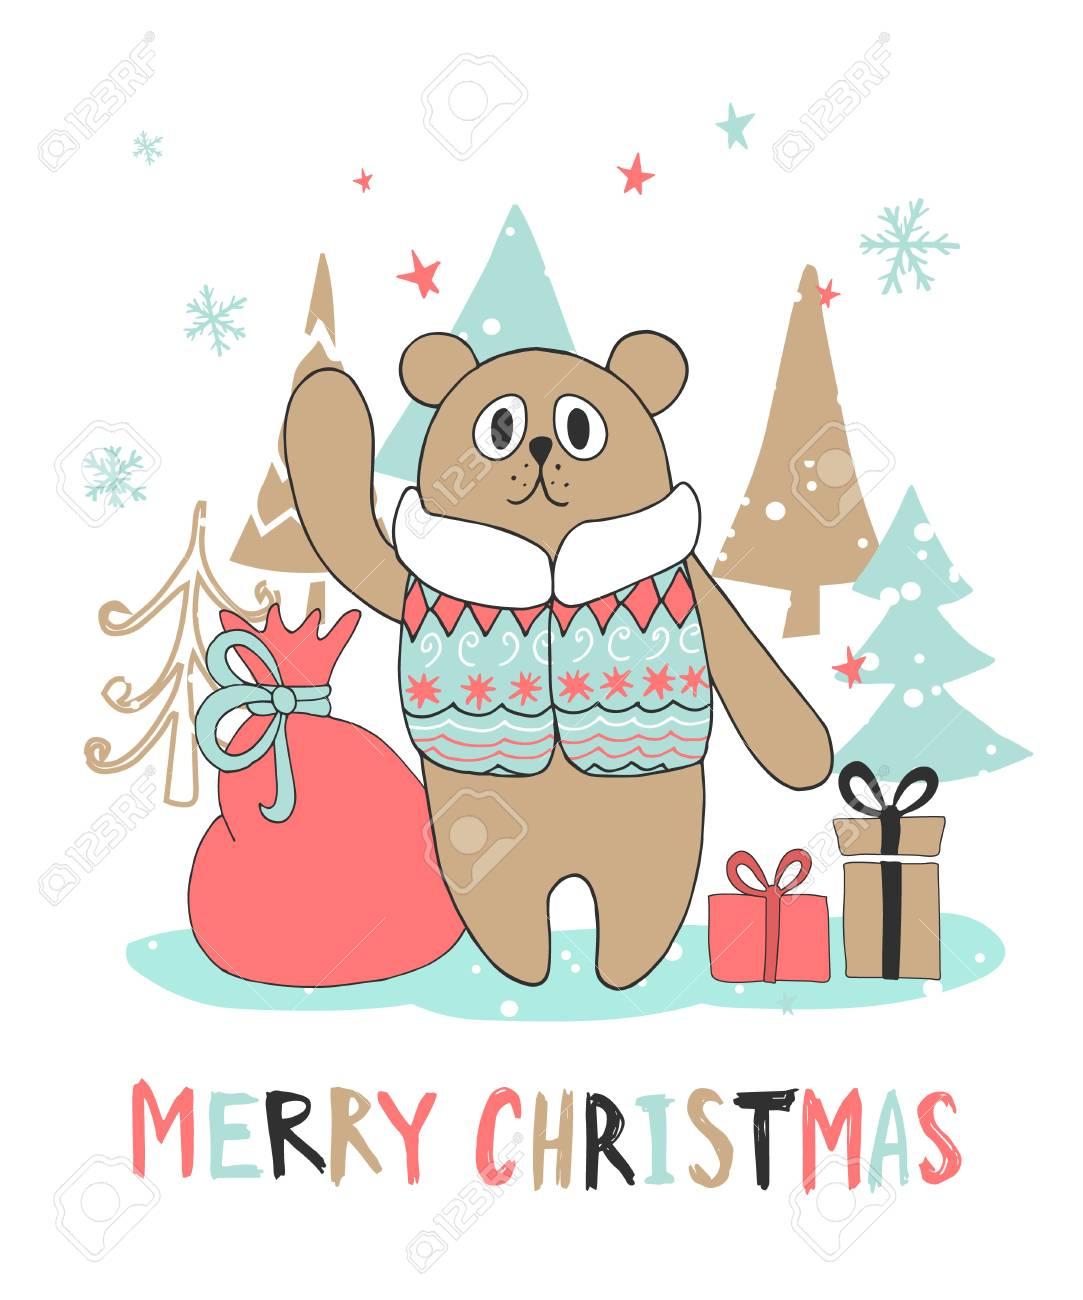 Cute Christmas Greeting Card With Bear Vector Illustration Royalty